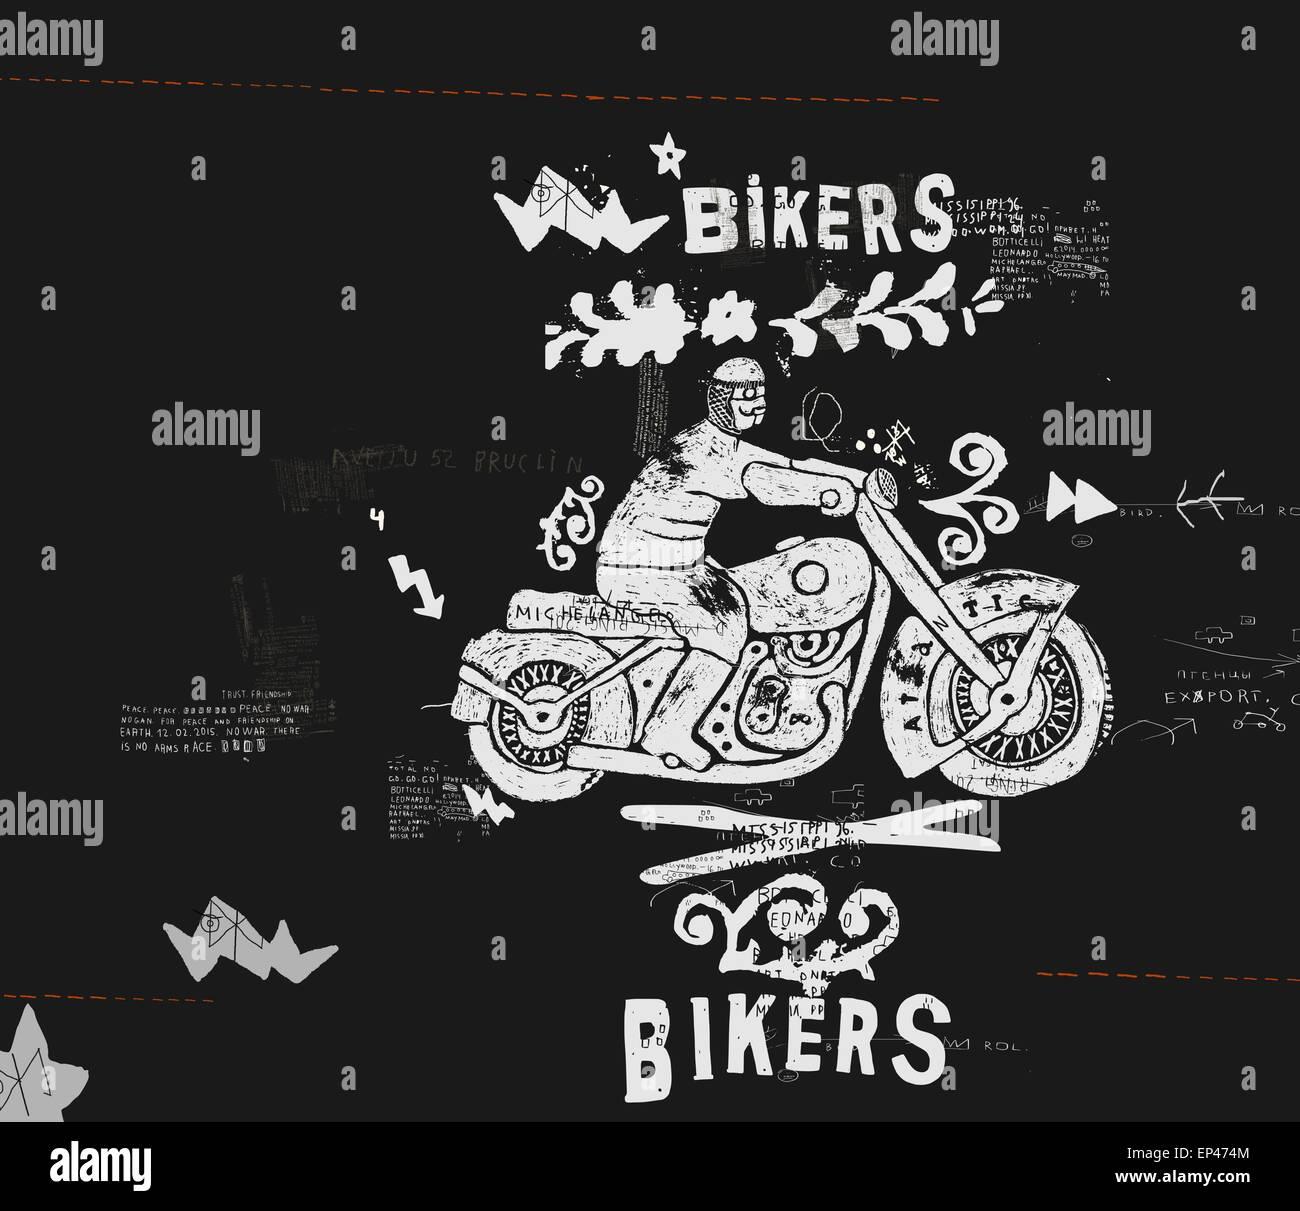 Motorcycle - Stock Image